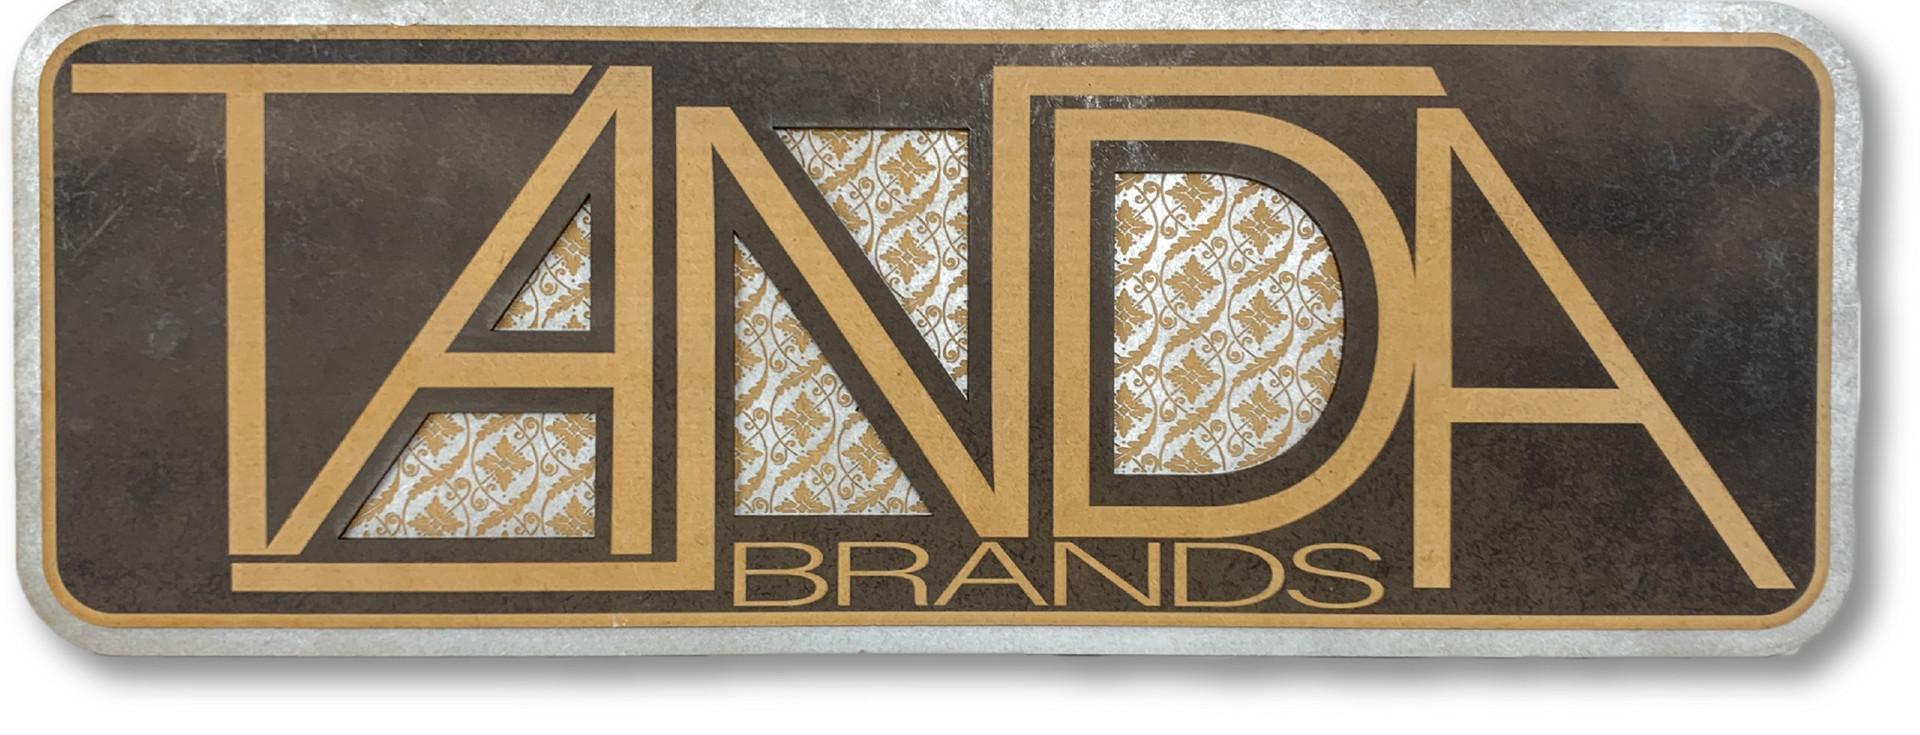 CUSTOM WOODEN SIGN | TANDA BRANDS